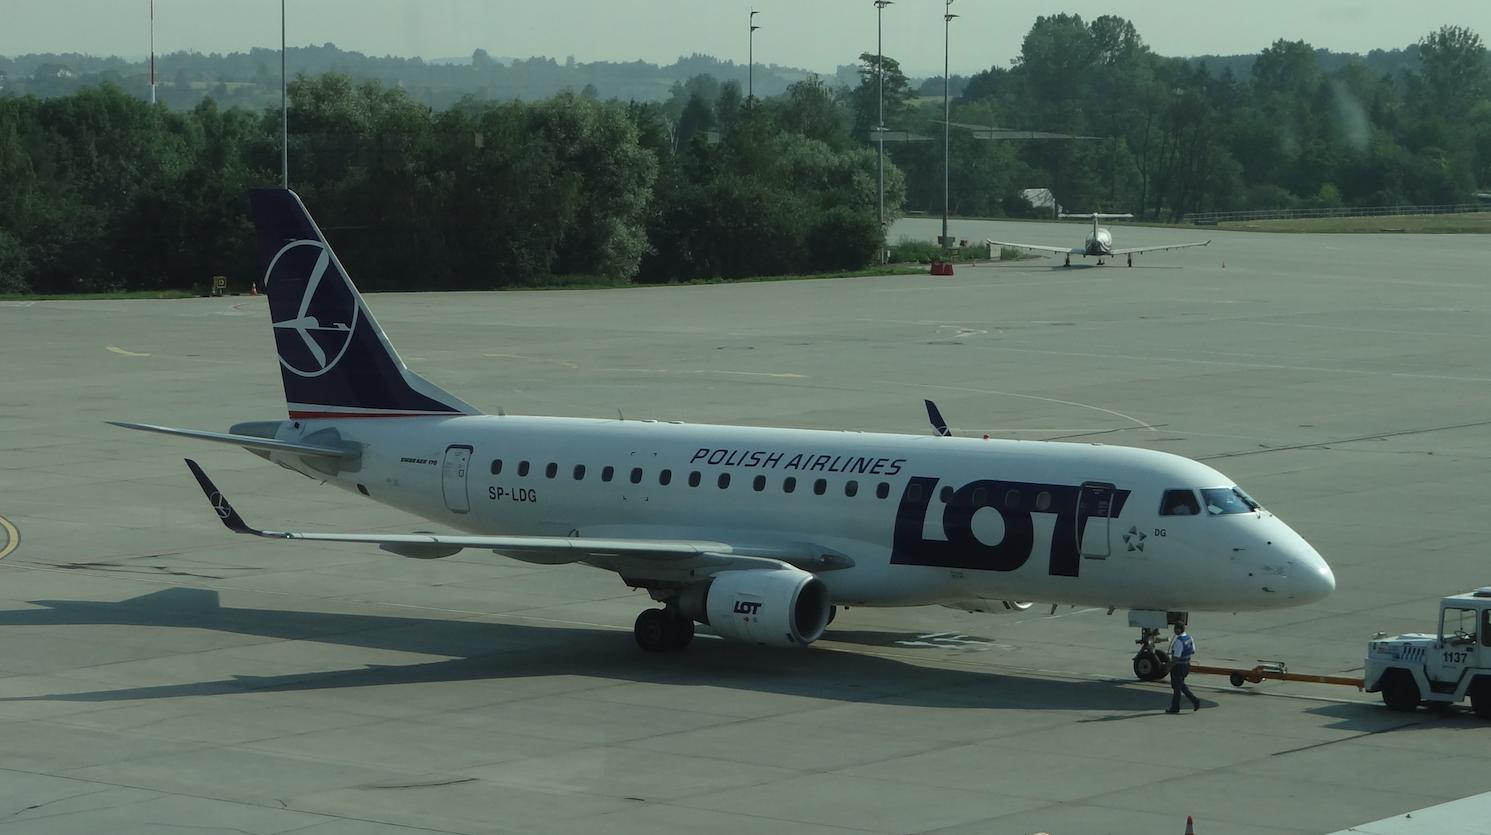 Embraer E-170 STD SP-LDG. 2012 rok. Zdjęcie Karol Placha Hetman